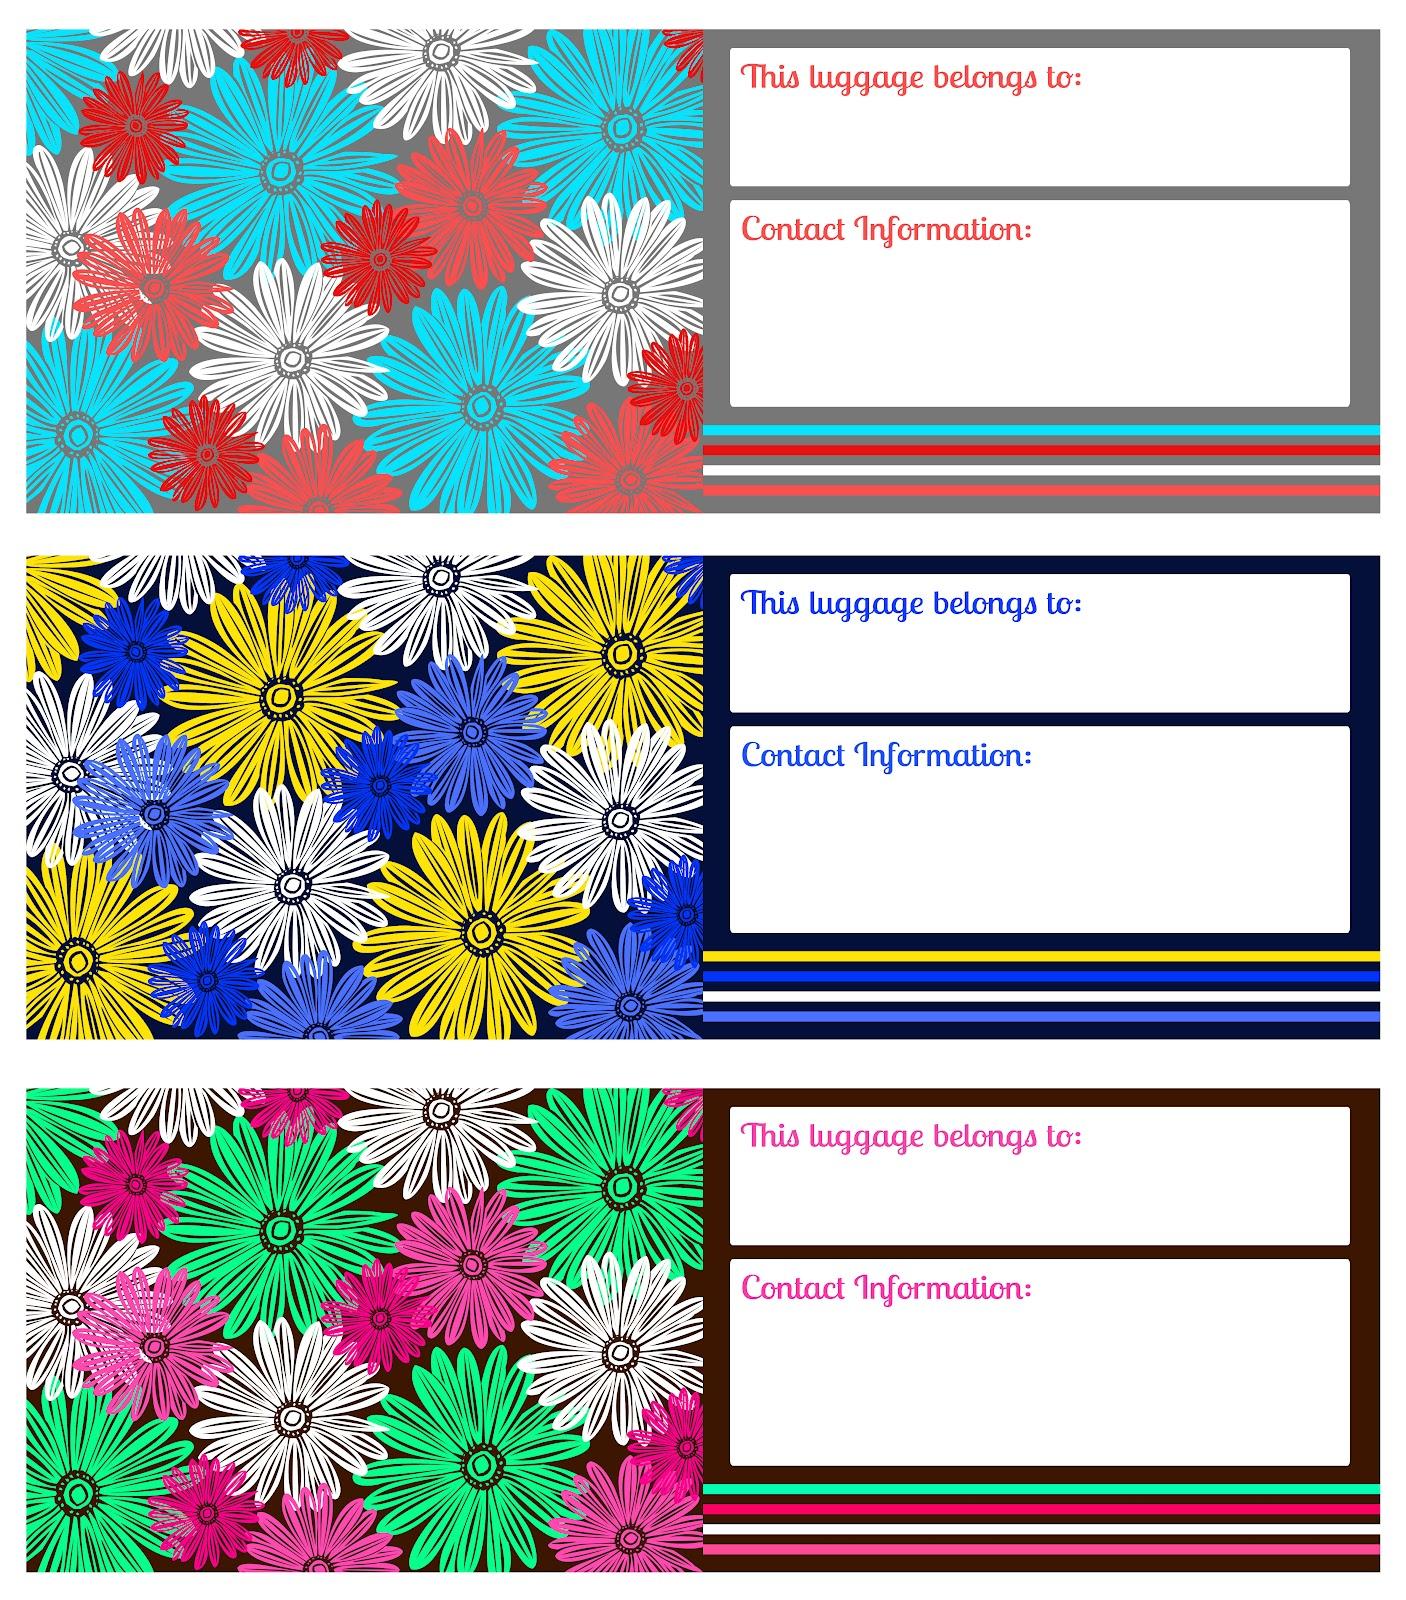 image relating to Printable Luggage Tags named Printable Baggage Tags - Darling Doodles